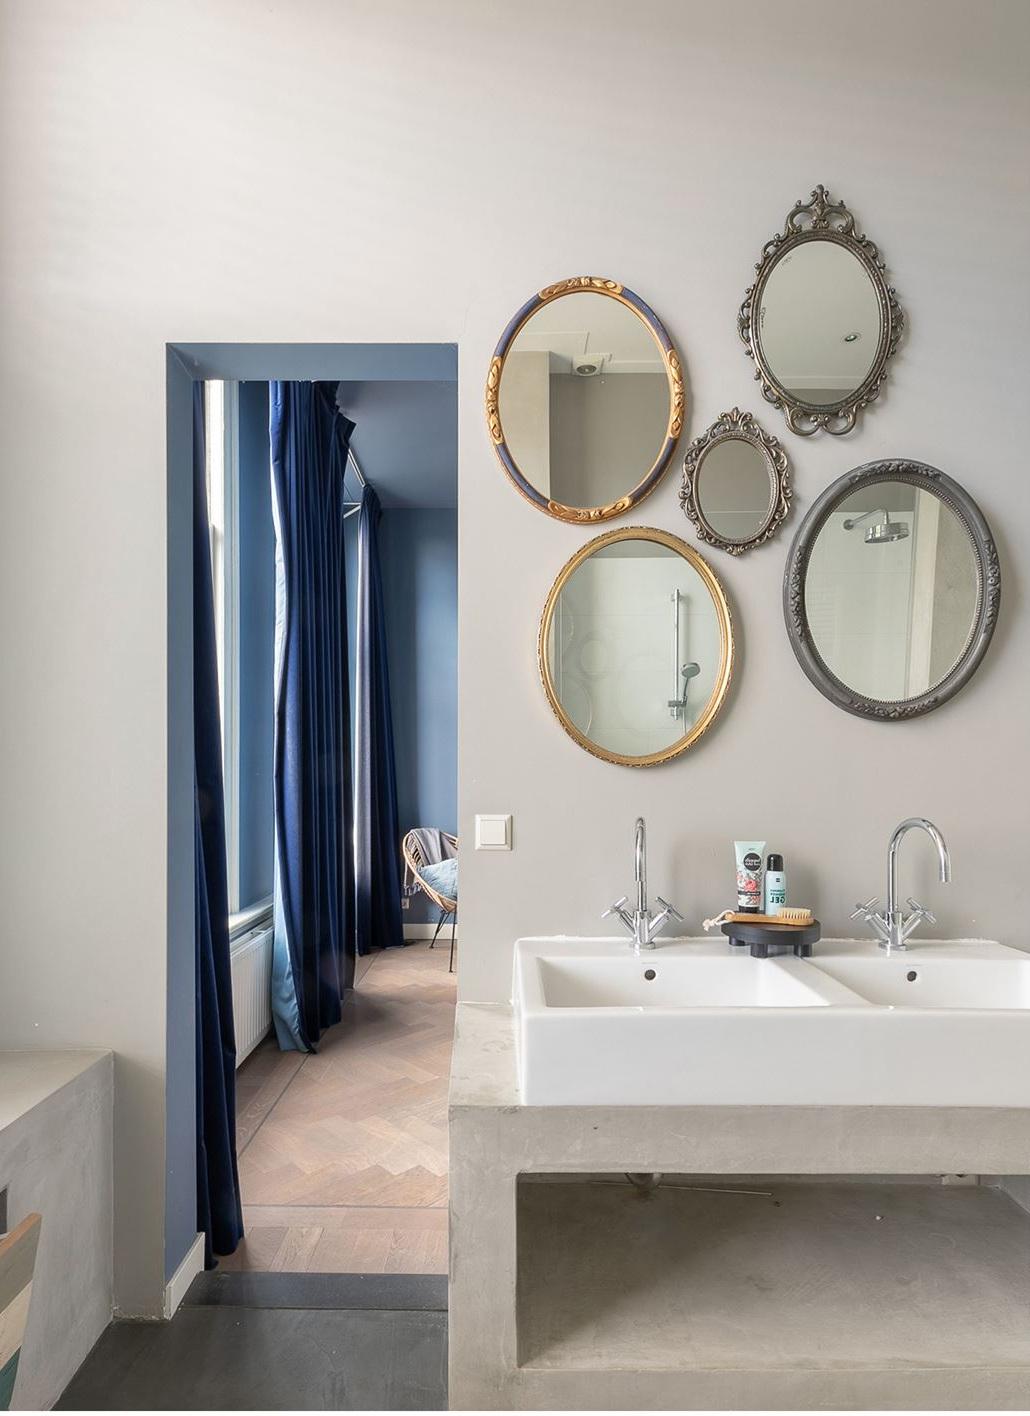 http://foto.barokspiegel.nl/blog/Meerdere-ronde-spiegels-in-de-badkamer-boven-wastafel.jpg